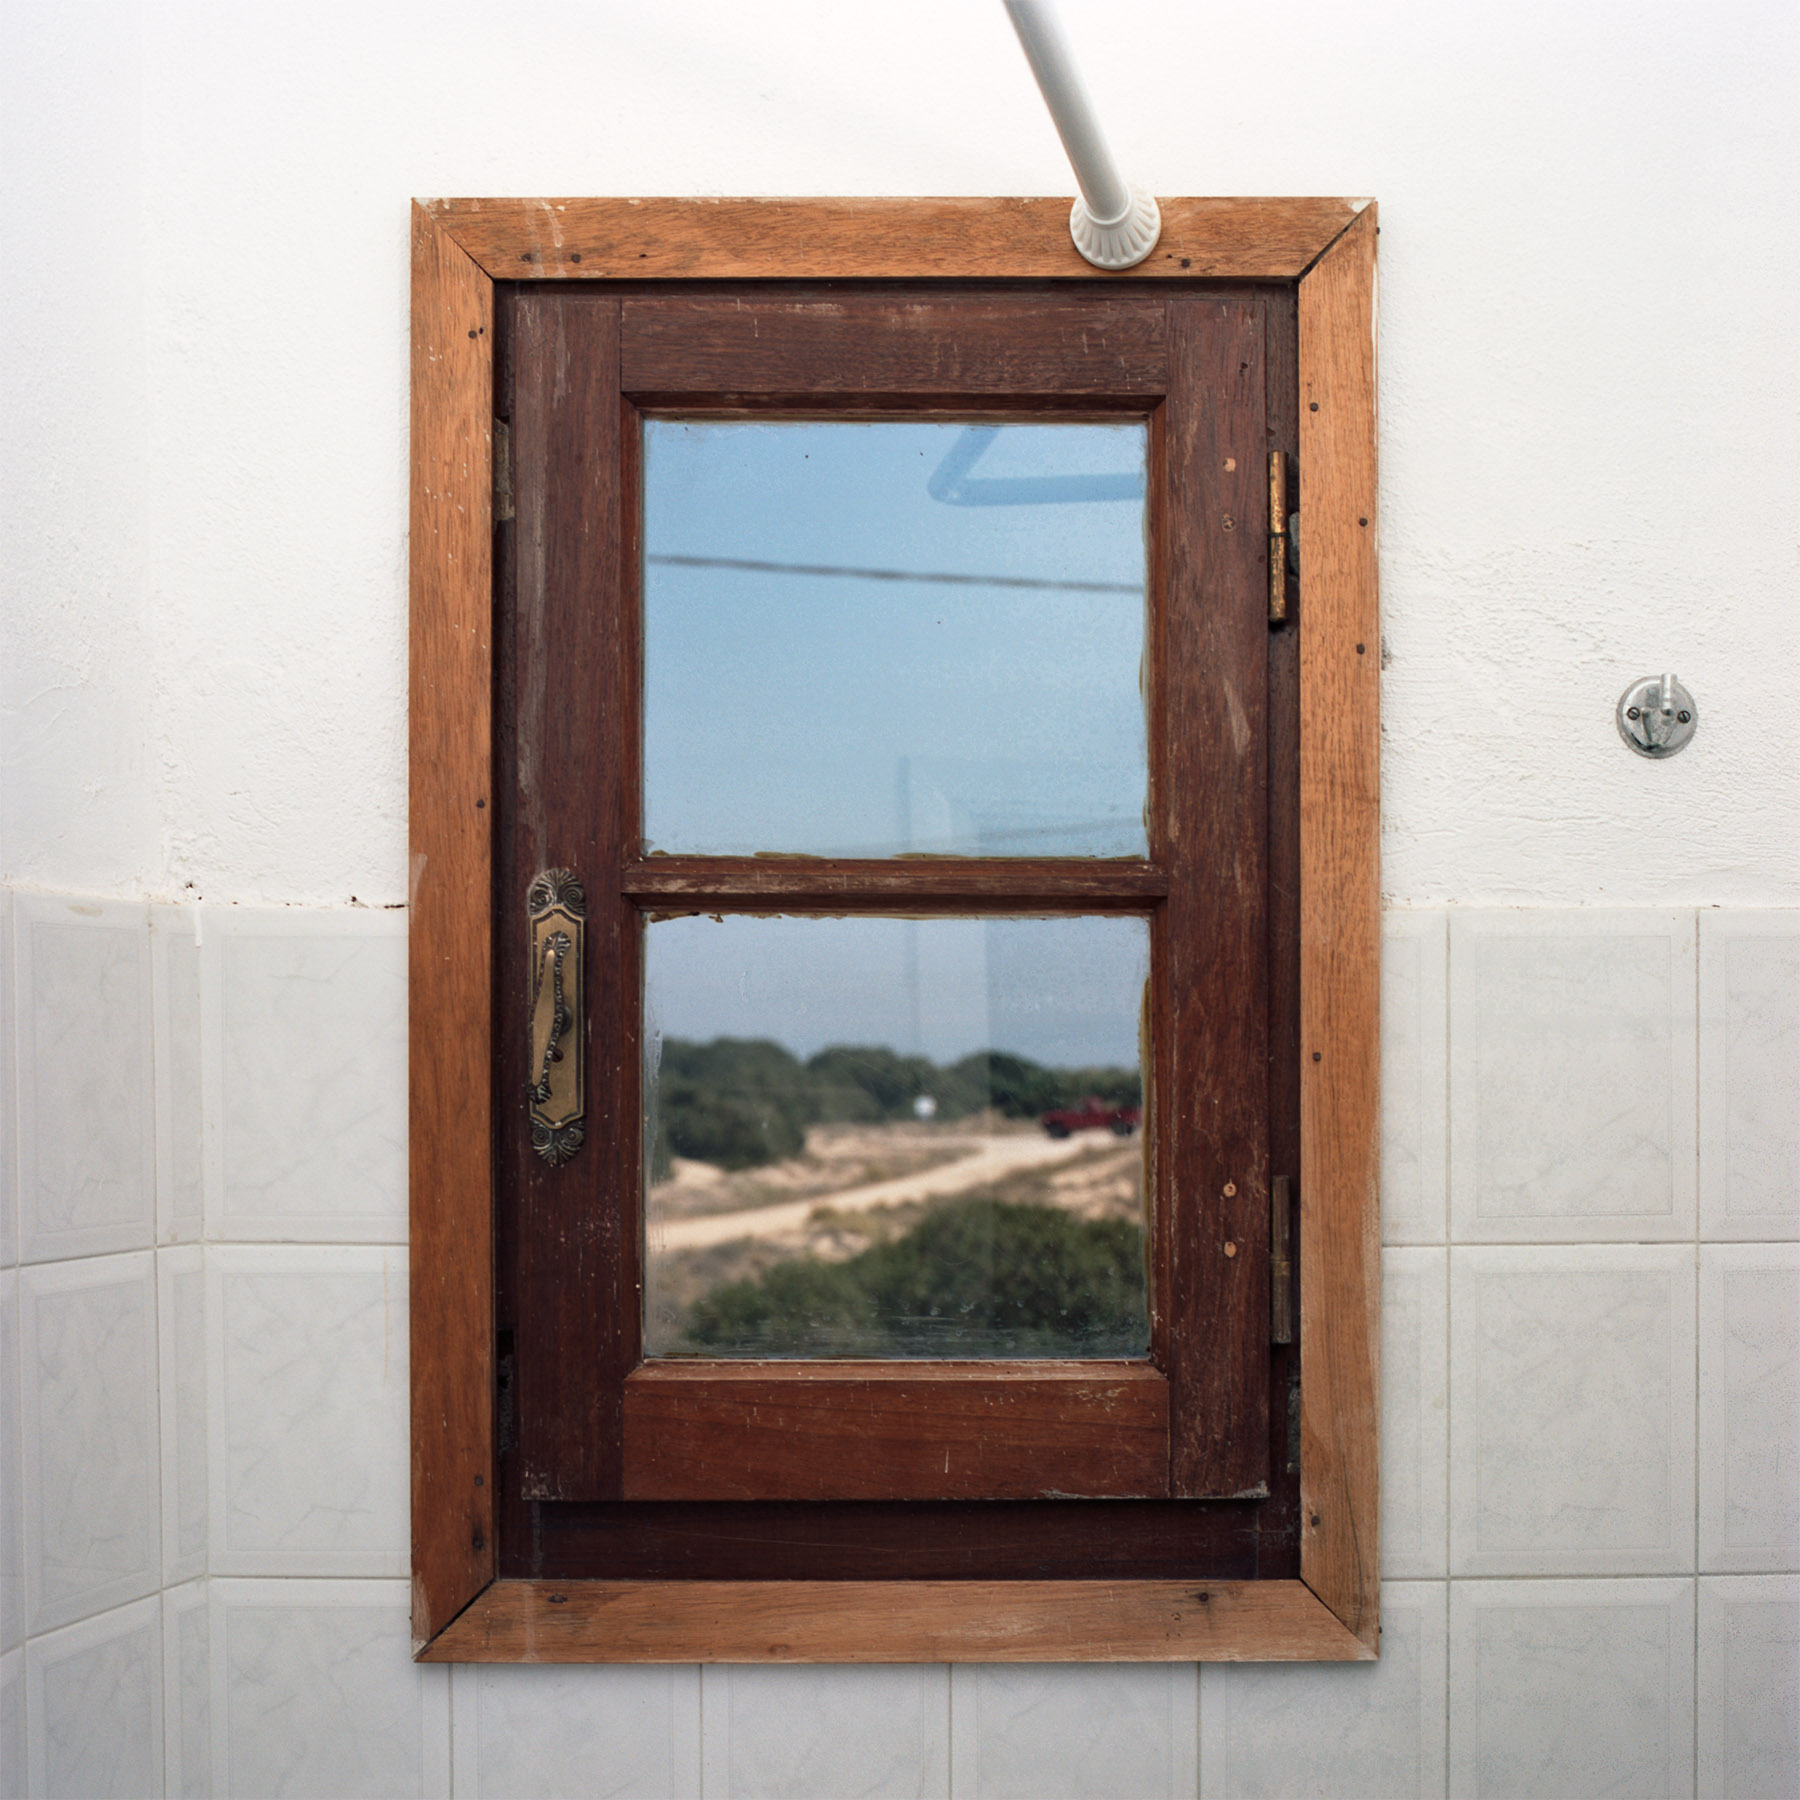 windows_grece_01.jpg